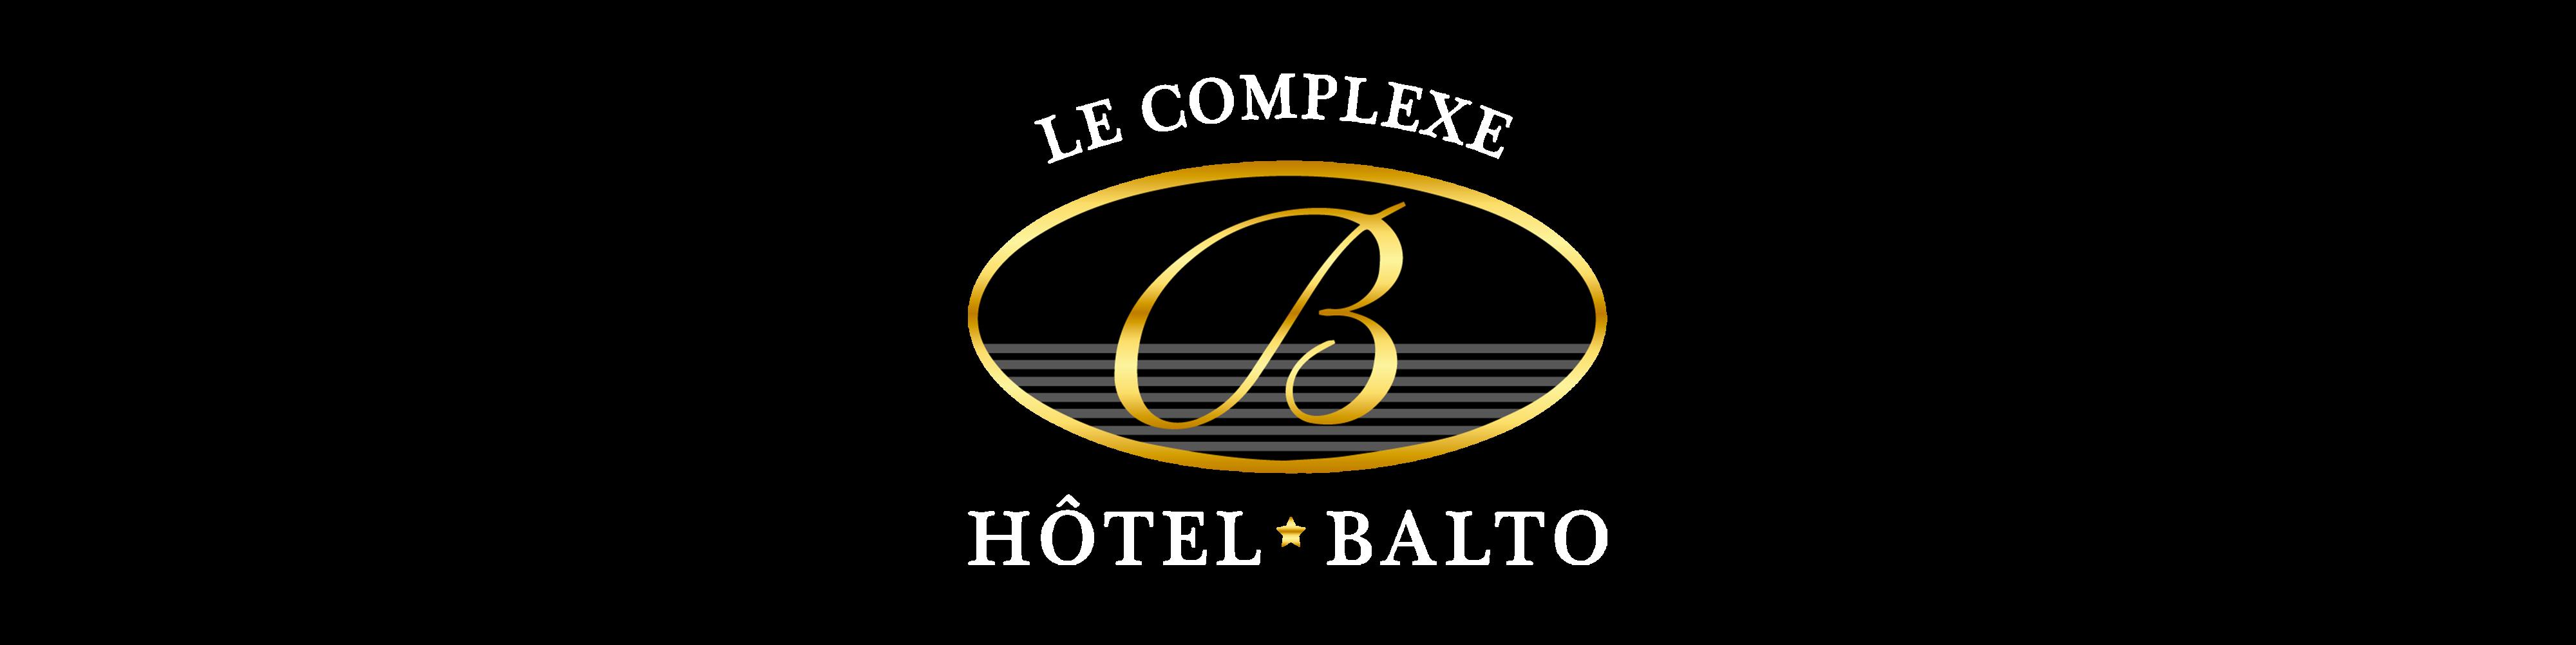 Le Complexe Hôtel Balto